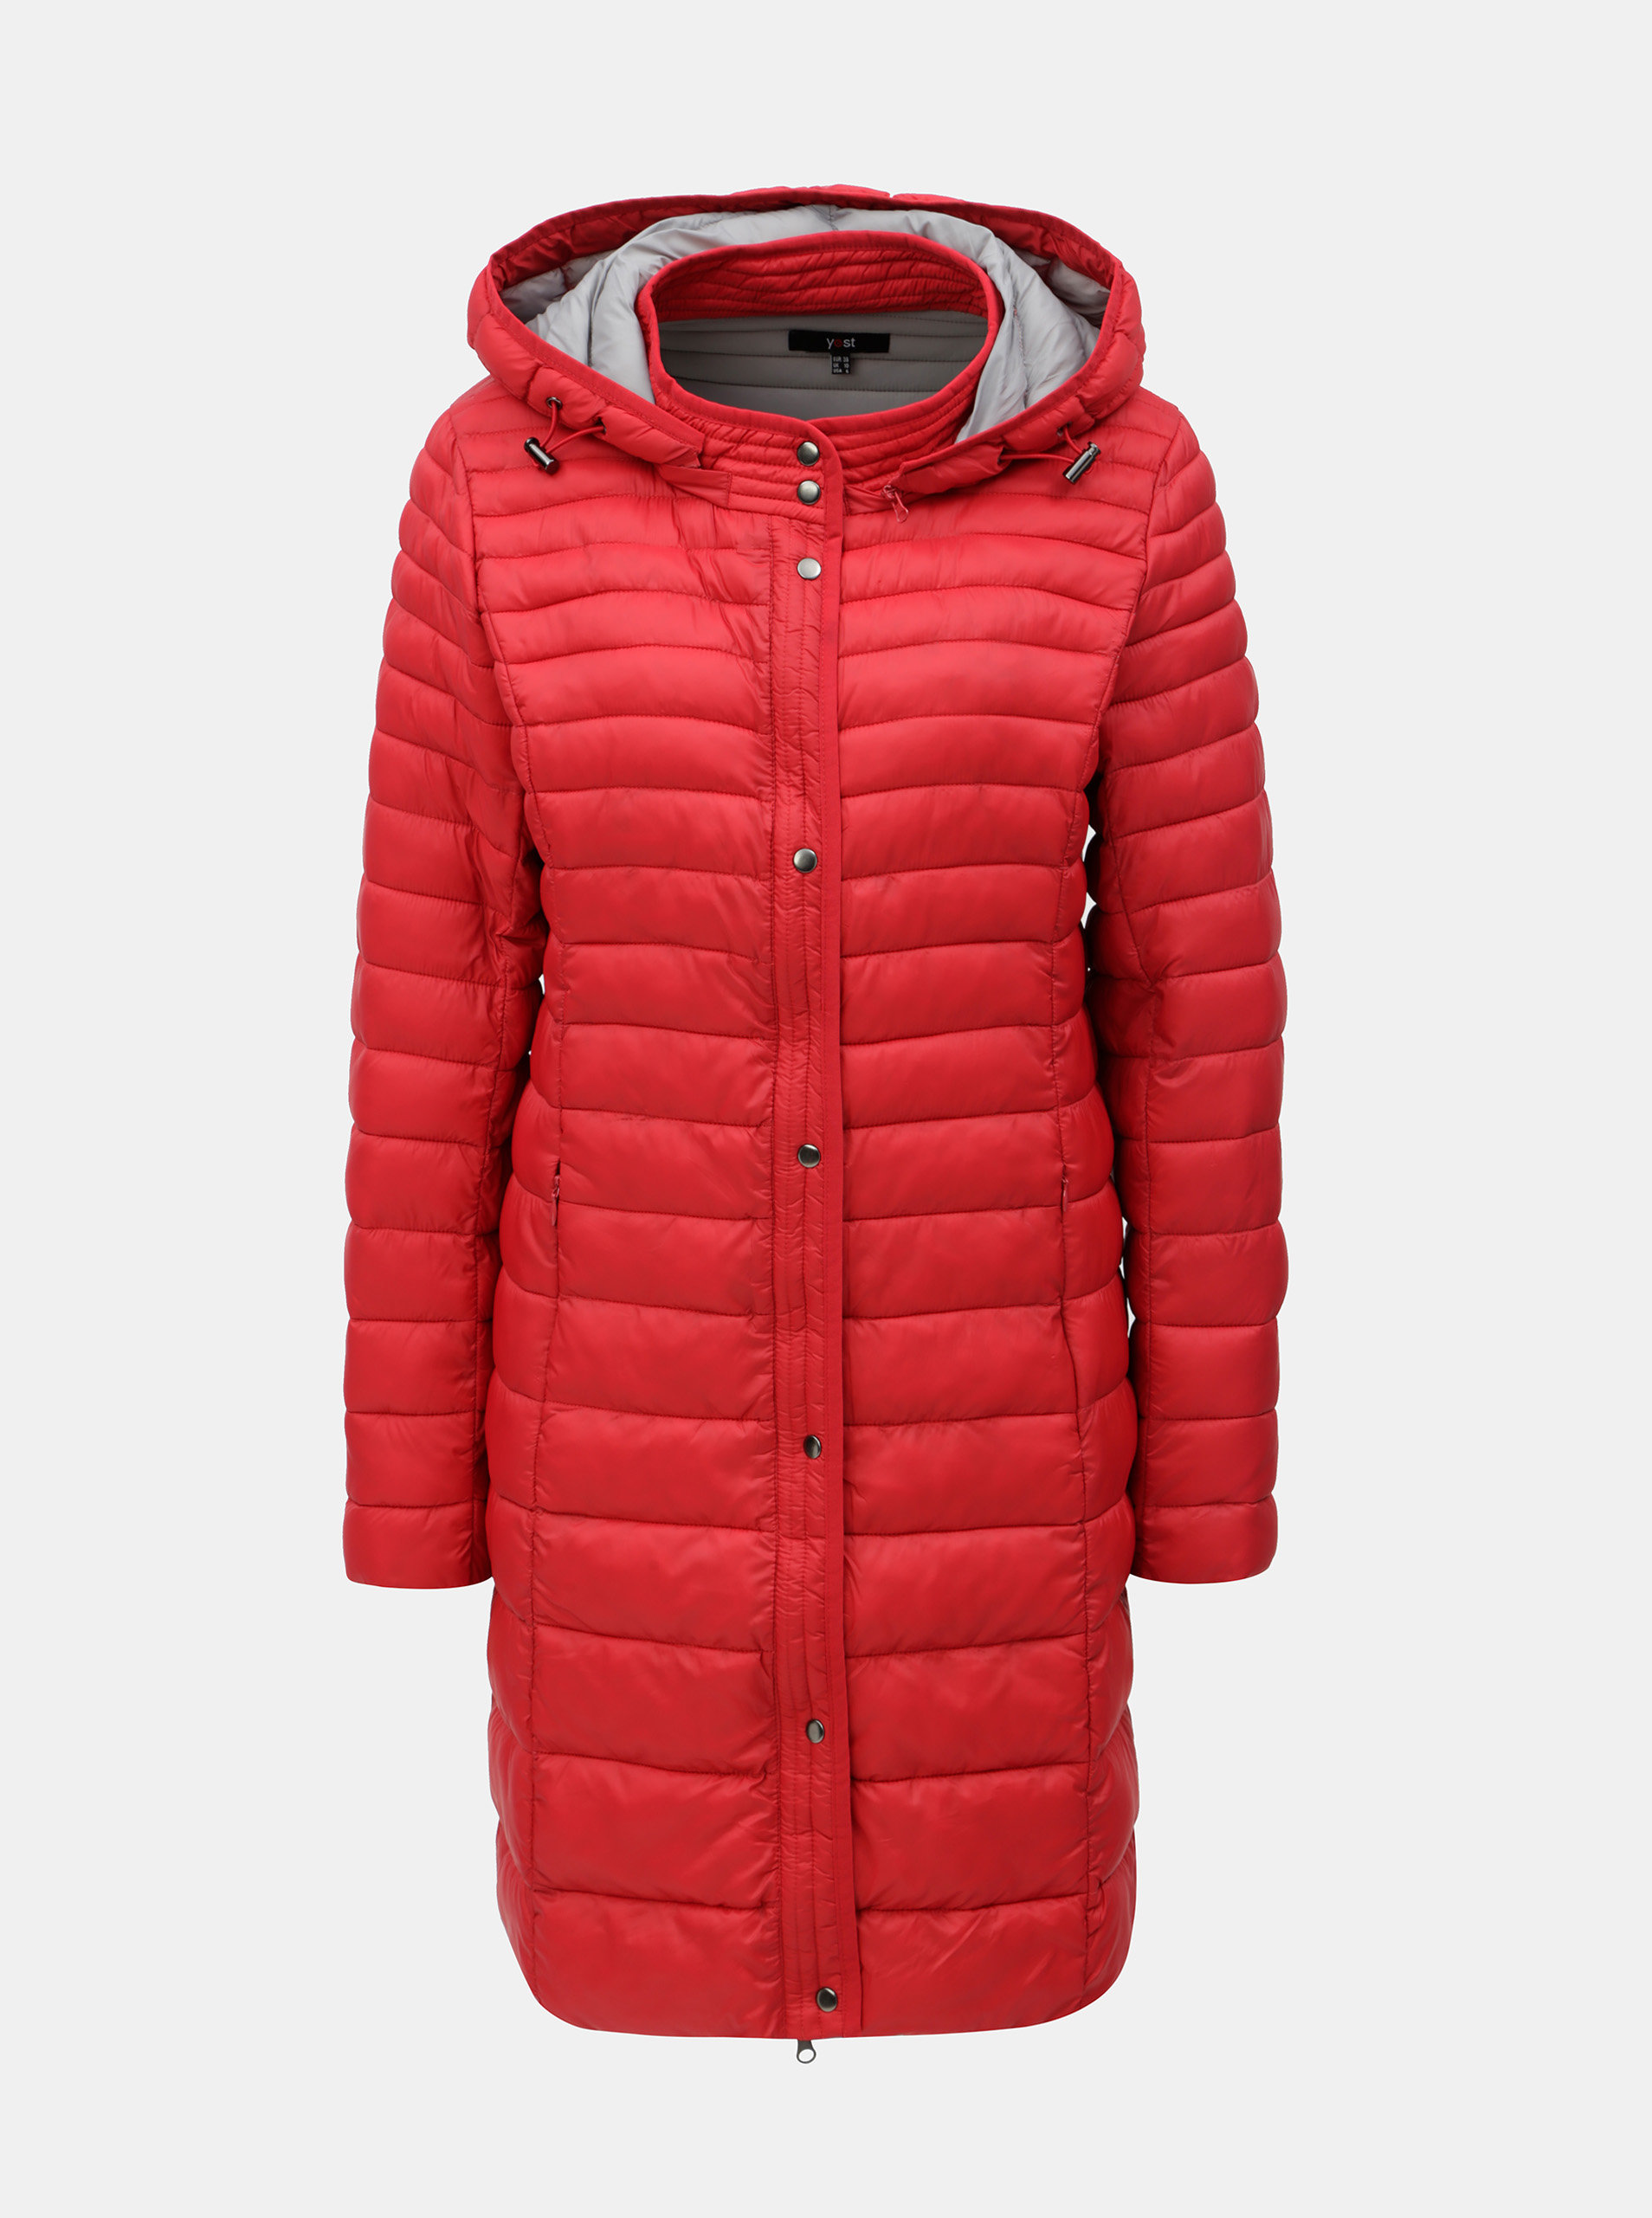 Červený prešívaný kabát s kapucňou Yest ... 57e2ba68824